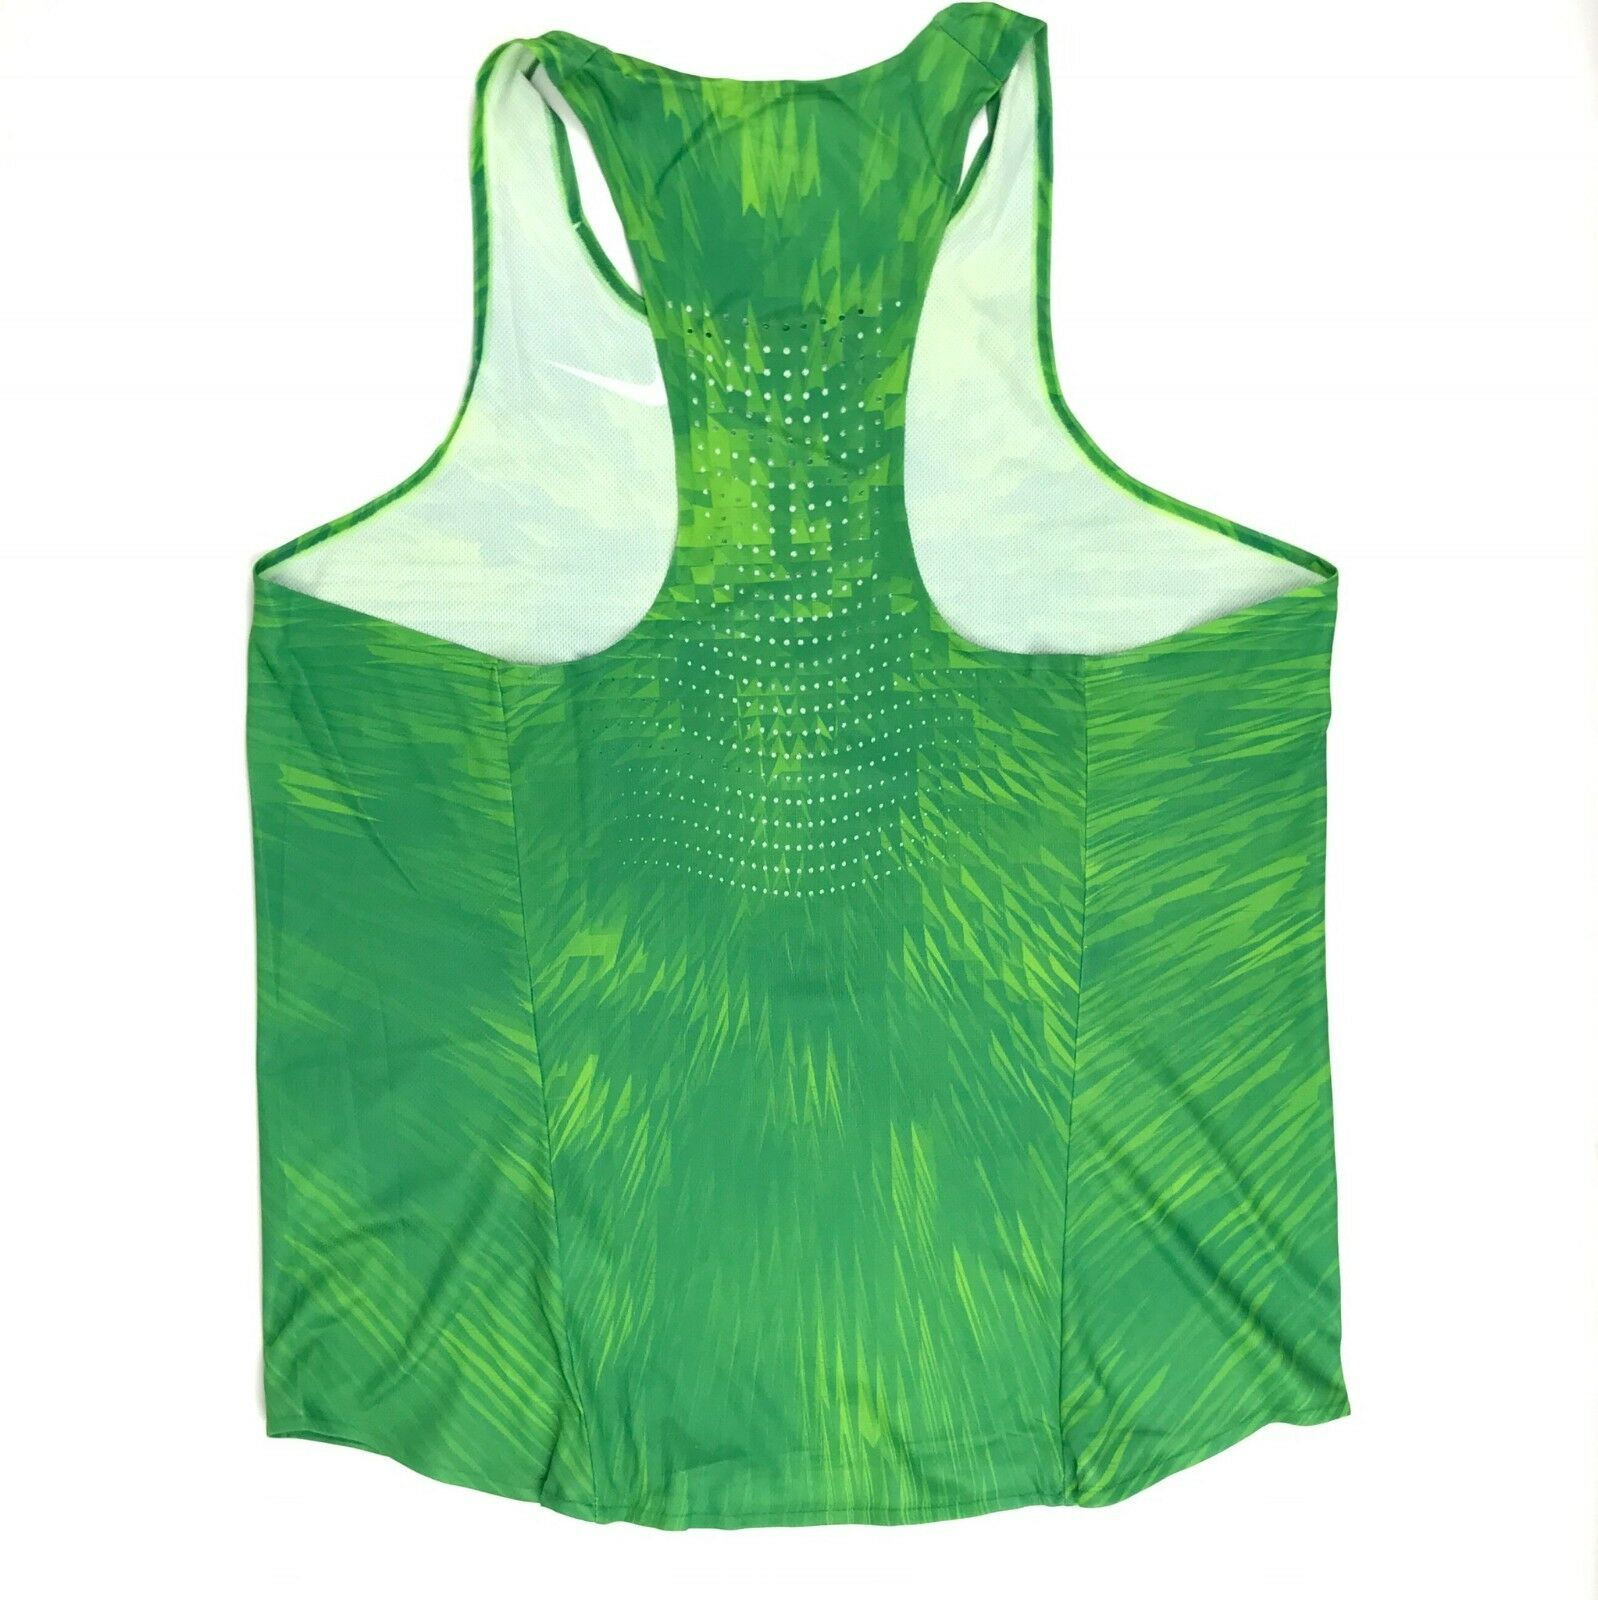 fb483cf94a8bc Nike Men s Large Digital Race Day Elite Running Singlet Track Green ...